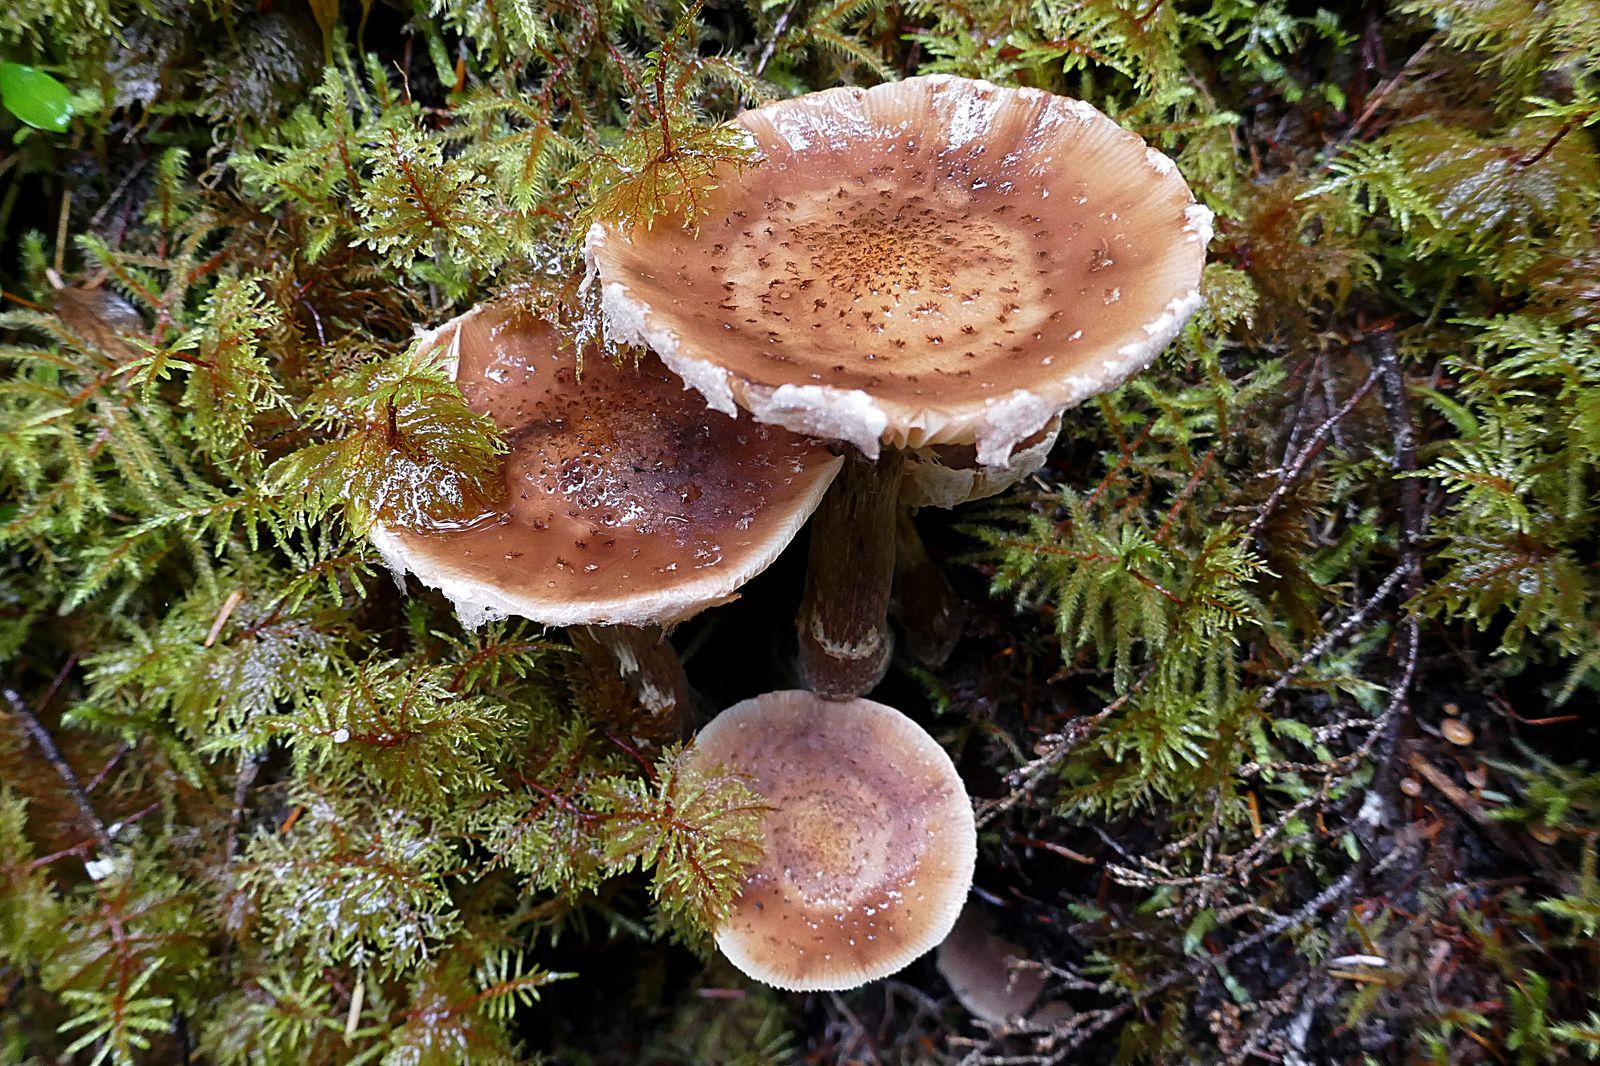 More pretty mushrooms